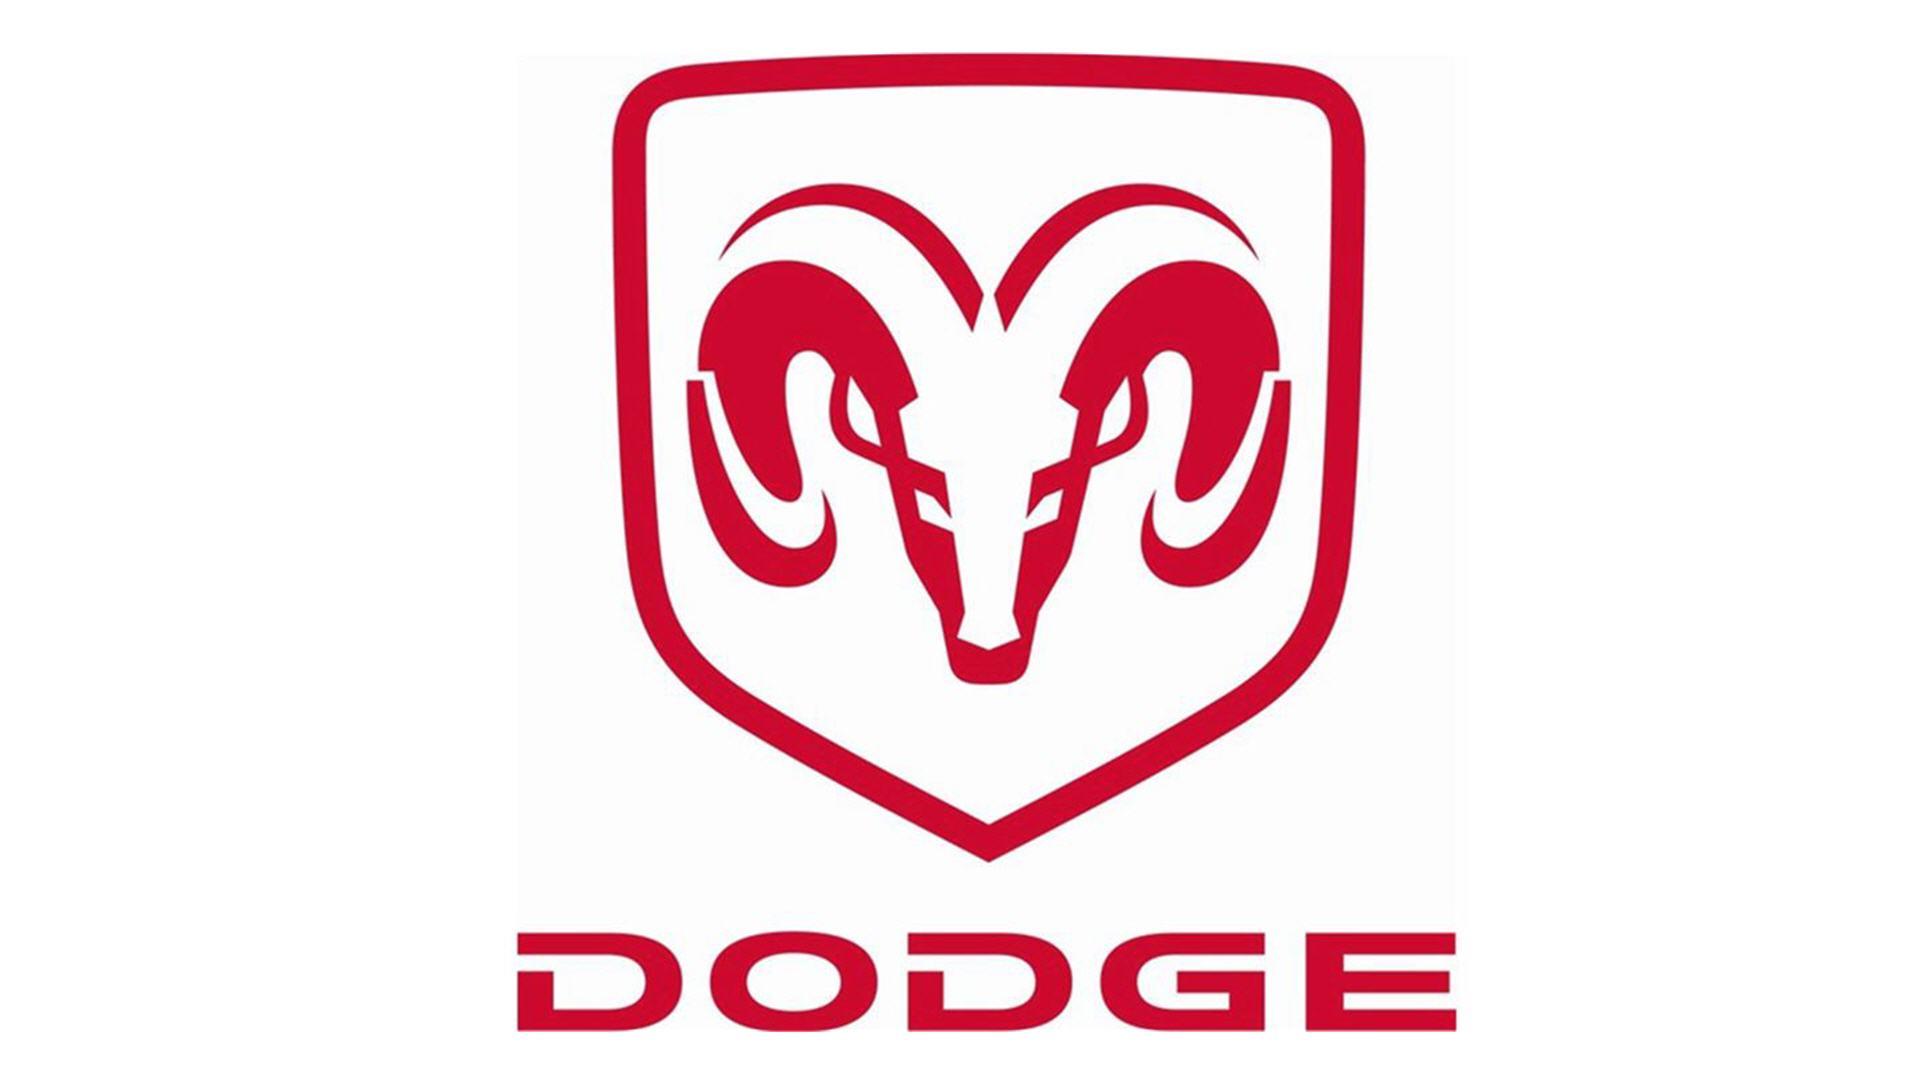 dodge logo wallpapers 4446 hd wallpapersjpg 1920x1080